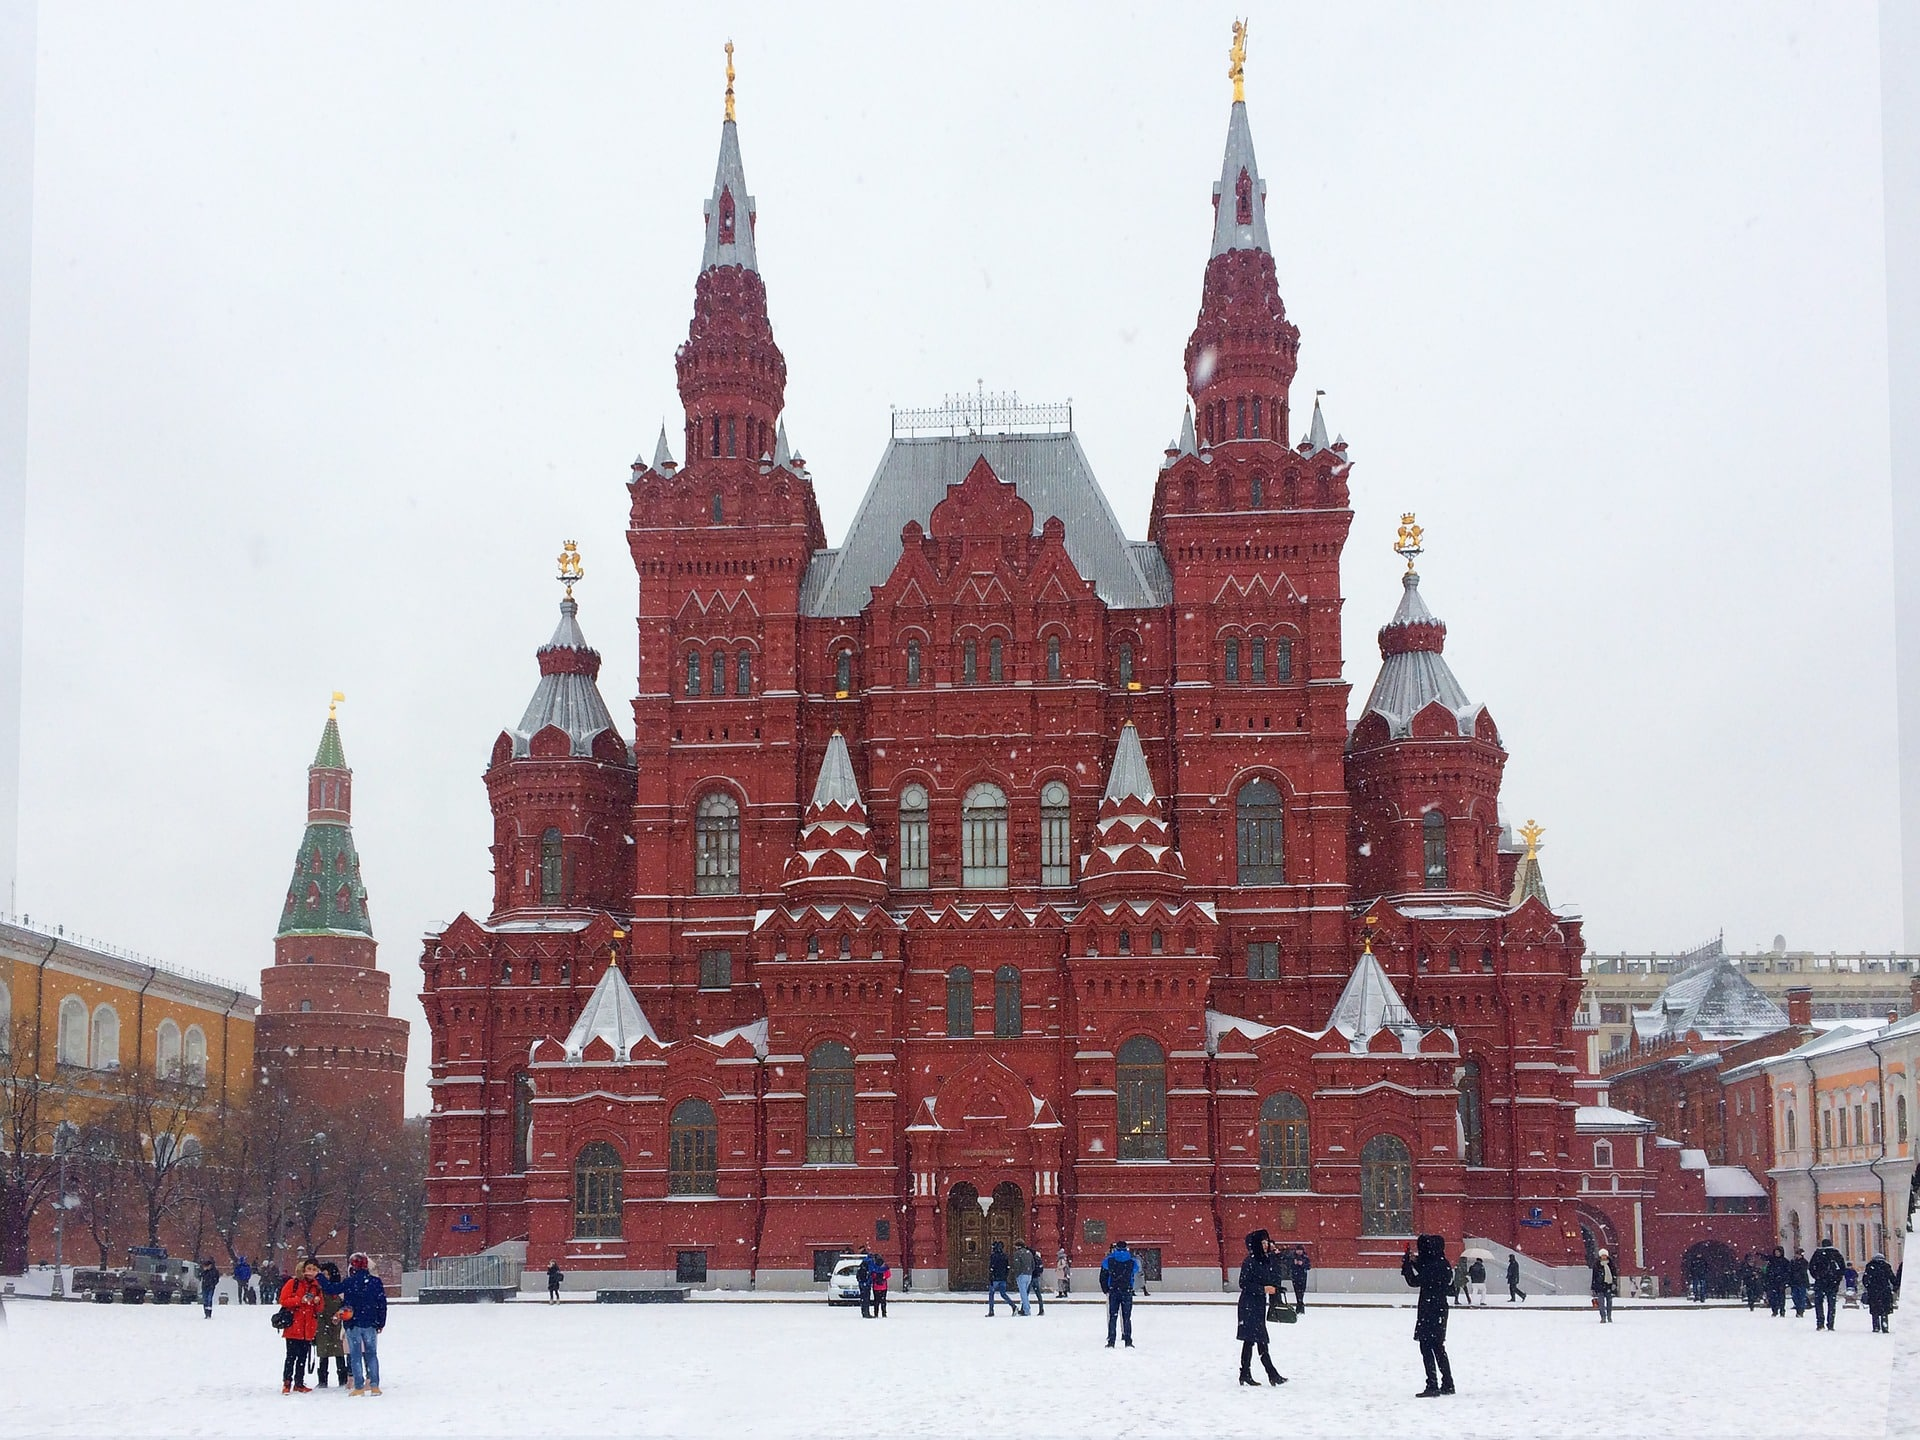 Plaza Roja en Moscú, Rusia, qué ver en 3 días